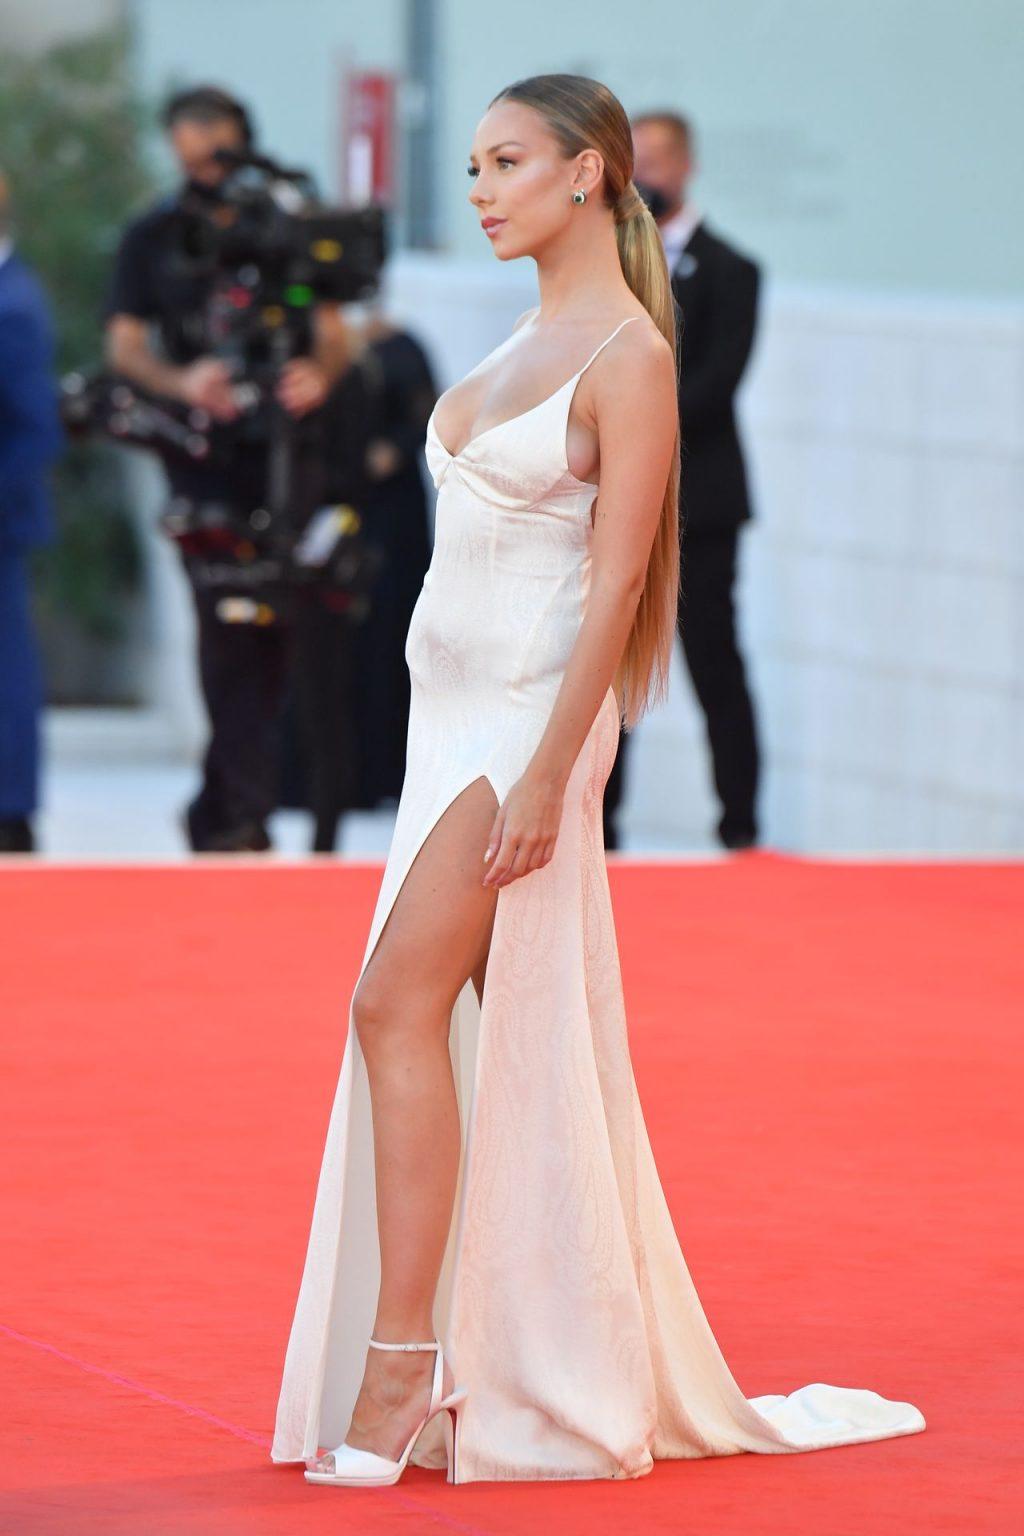 Ester Exposito Stuns in a White Dress at the Venice Film Festival (152 Photos)